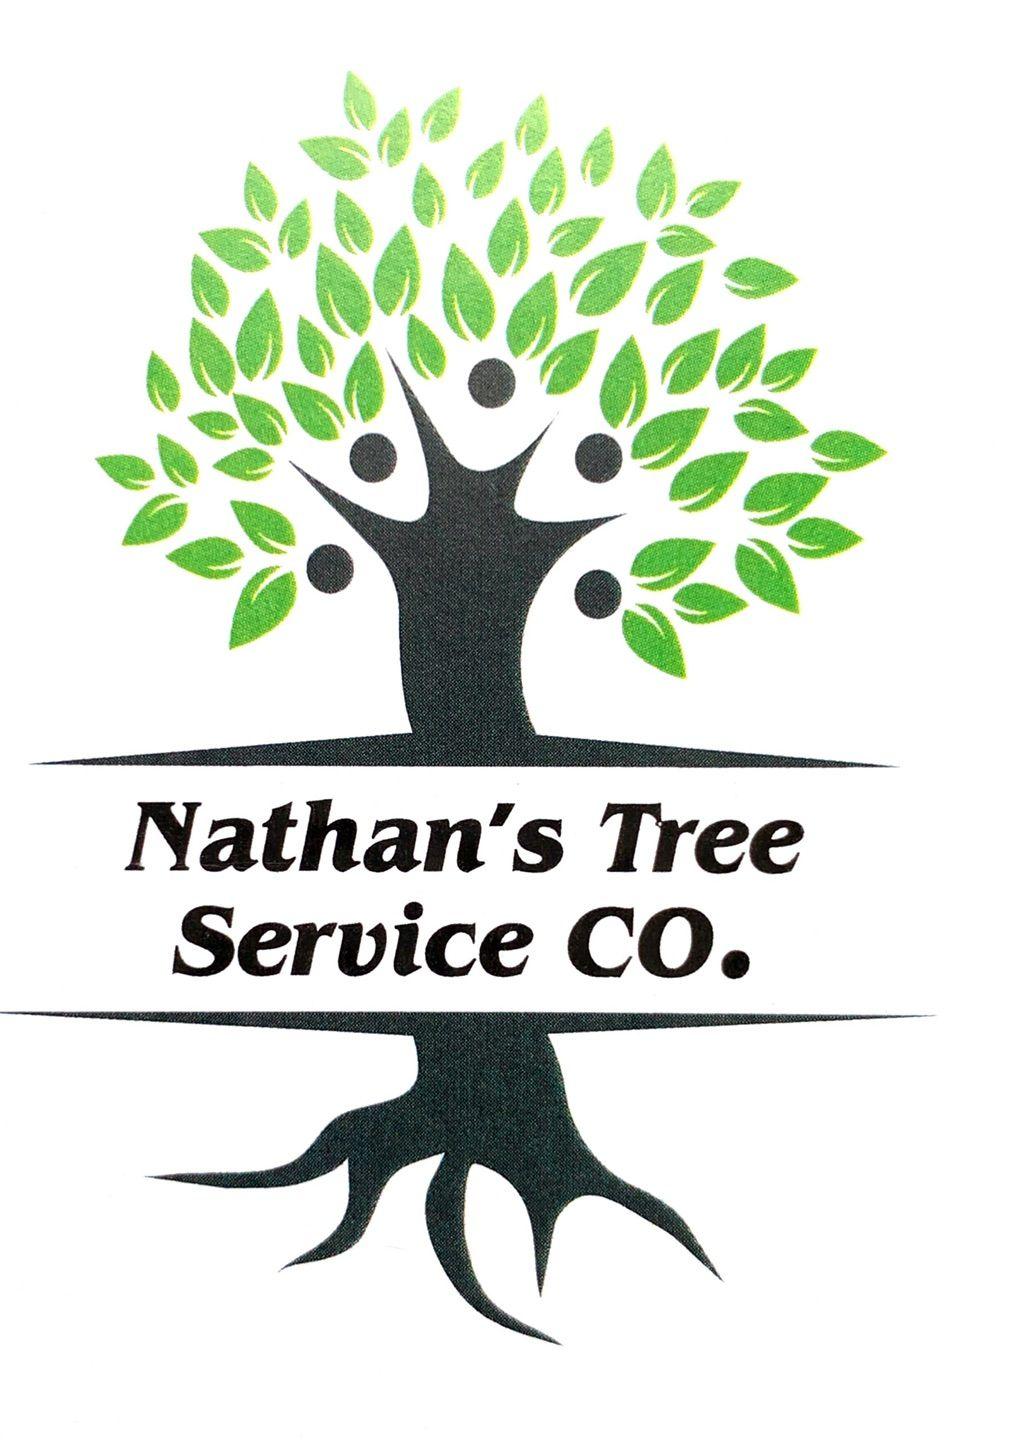 Nathan's tree service